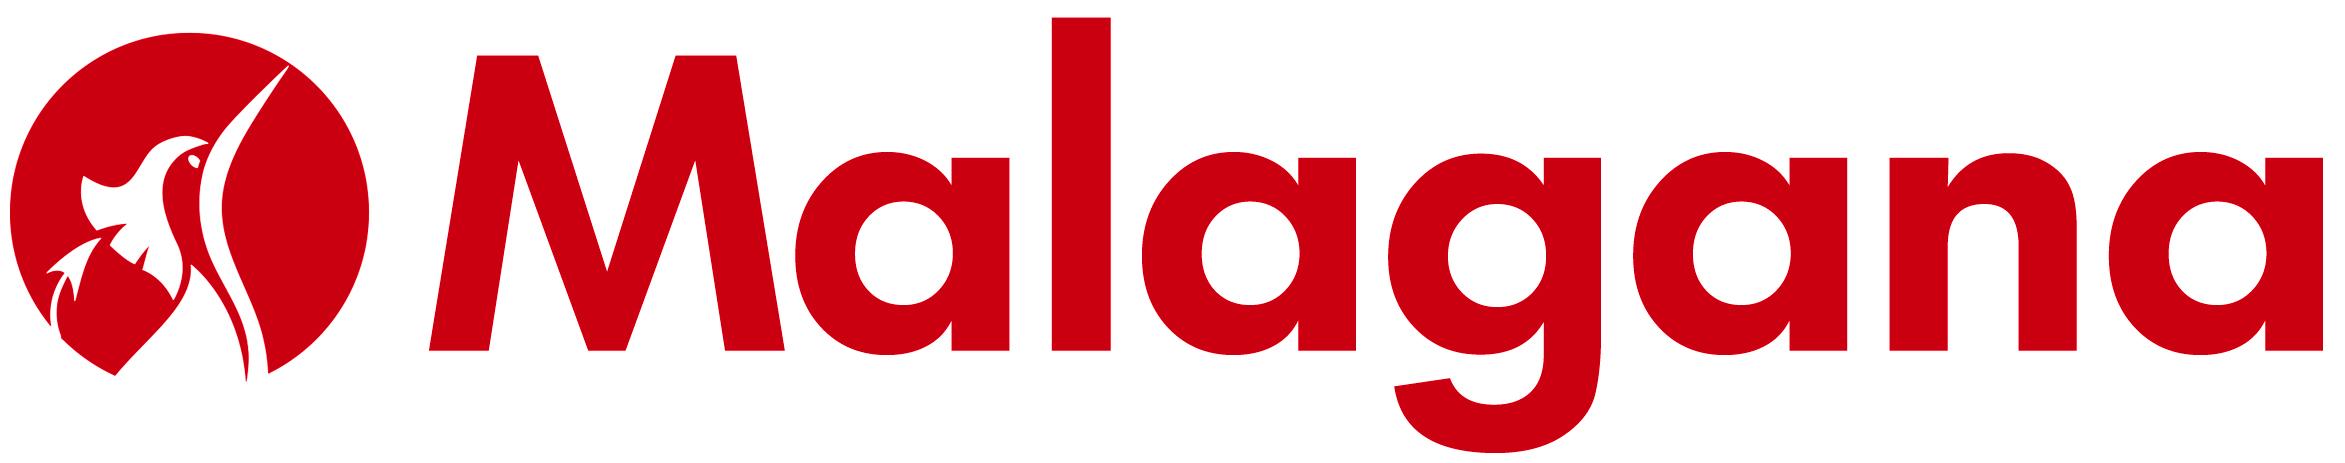 Malagana Logo